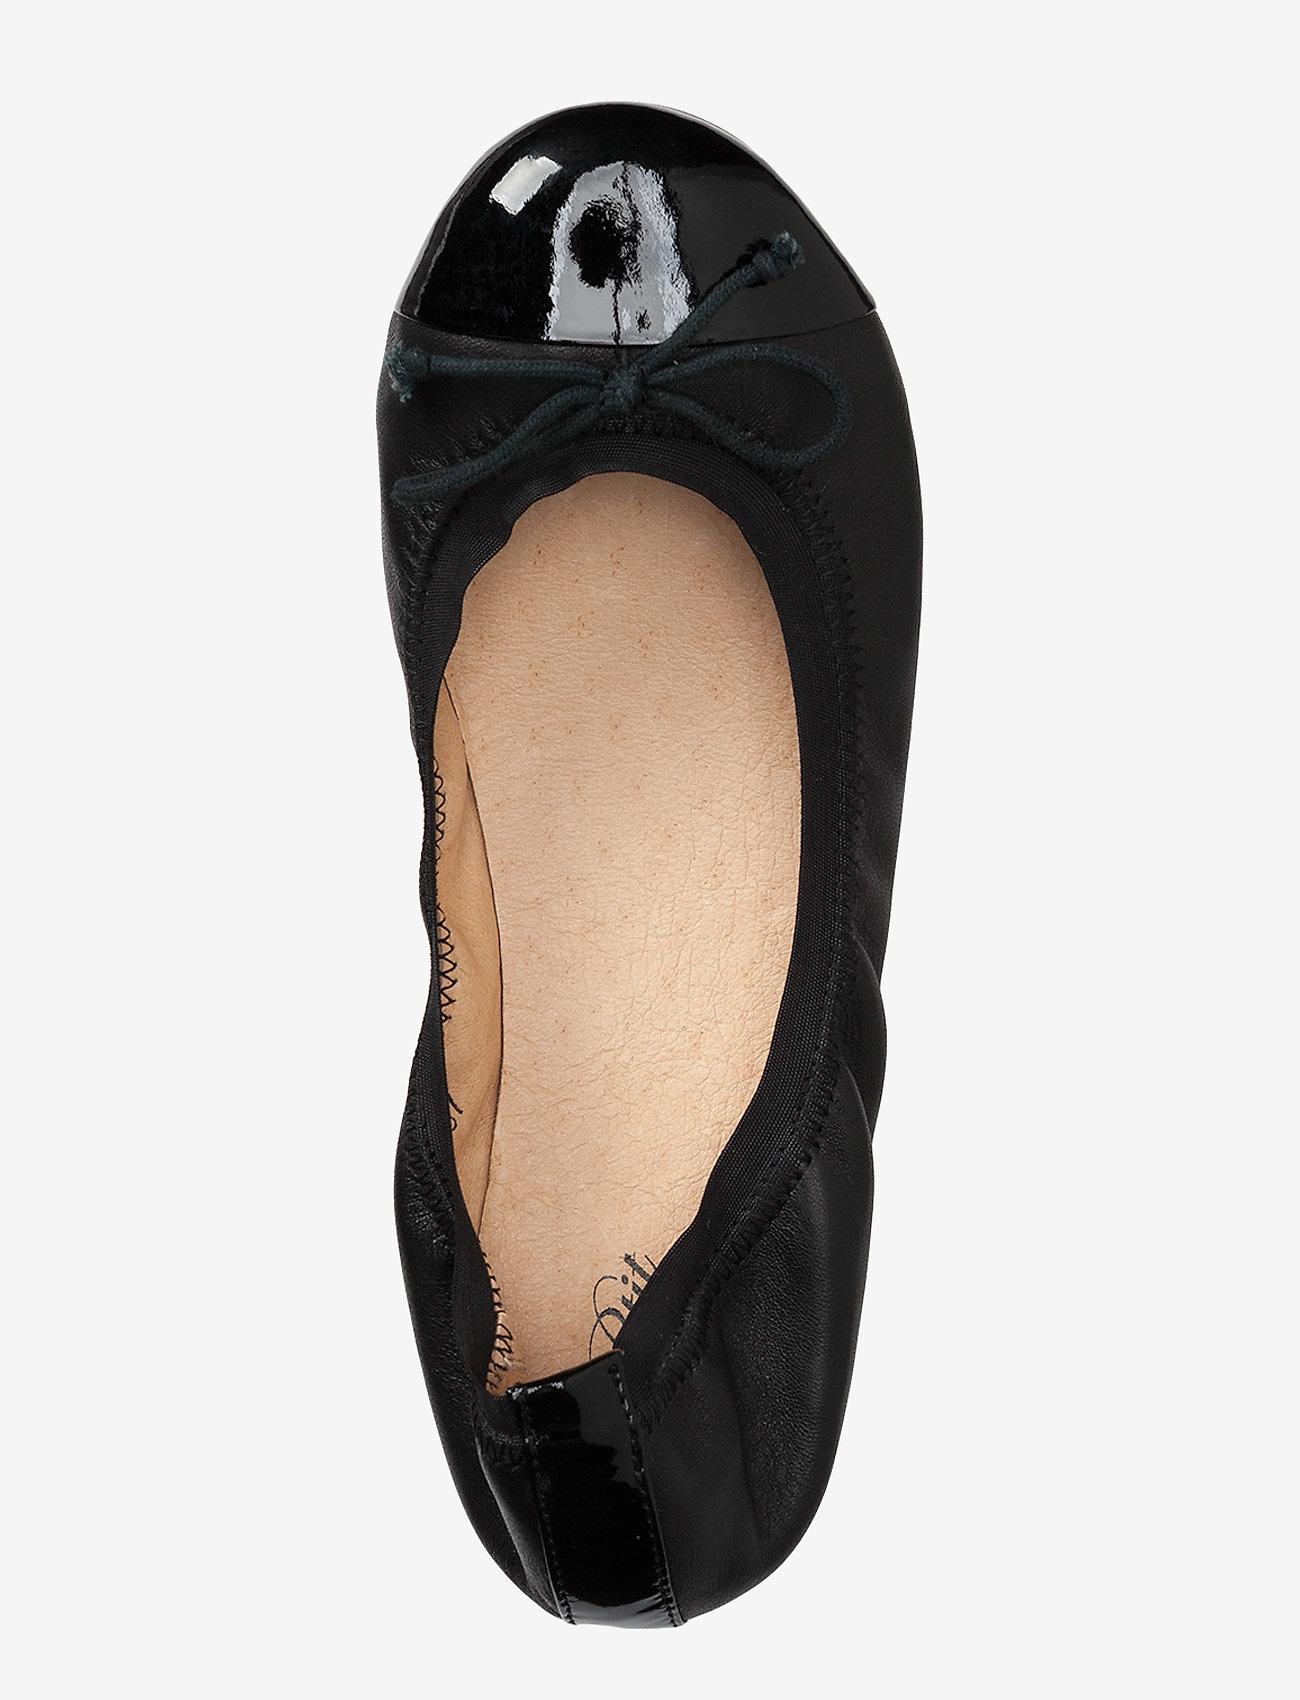 Petit by Sofie Schnoor - Leather ballerina - black - 1